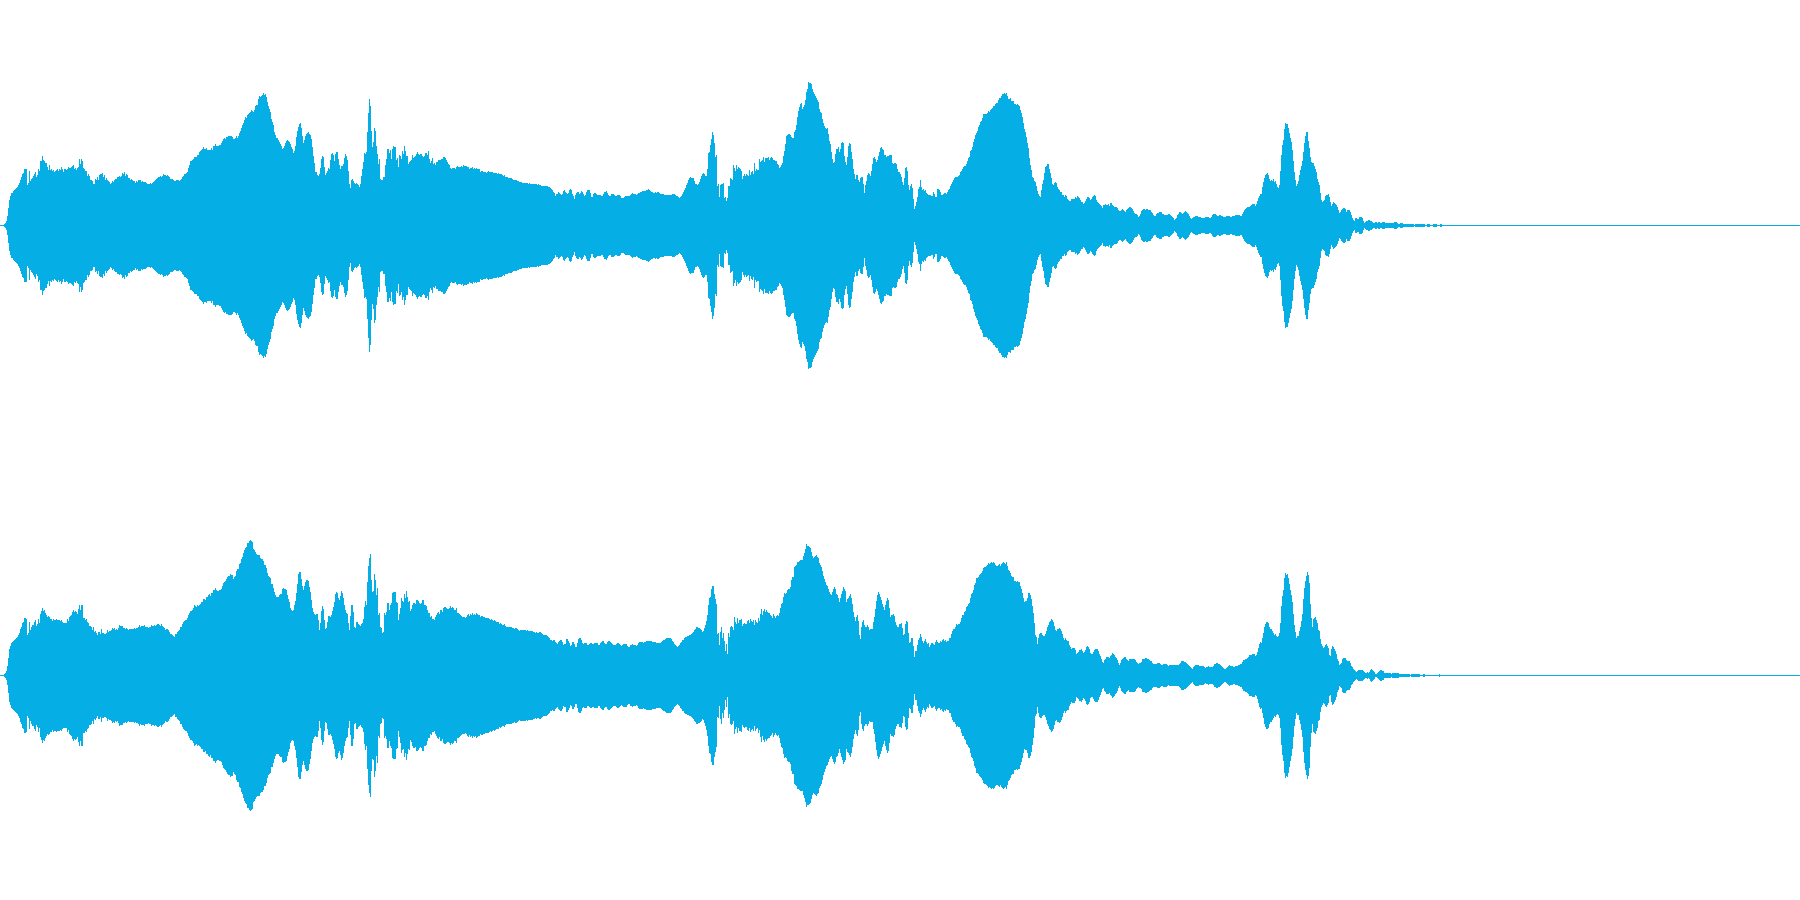 尺八 生演奏 古典風 残響音有 #14の再生済みの波形